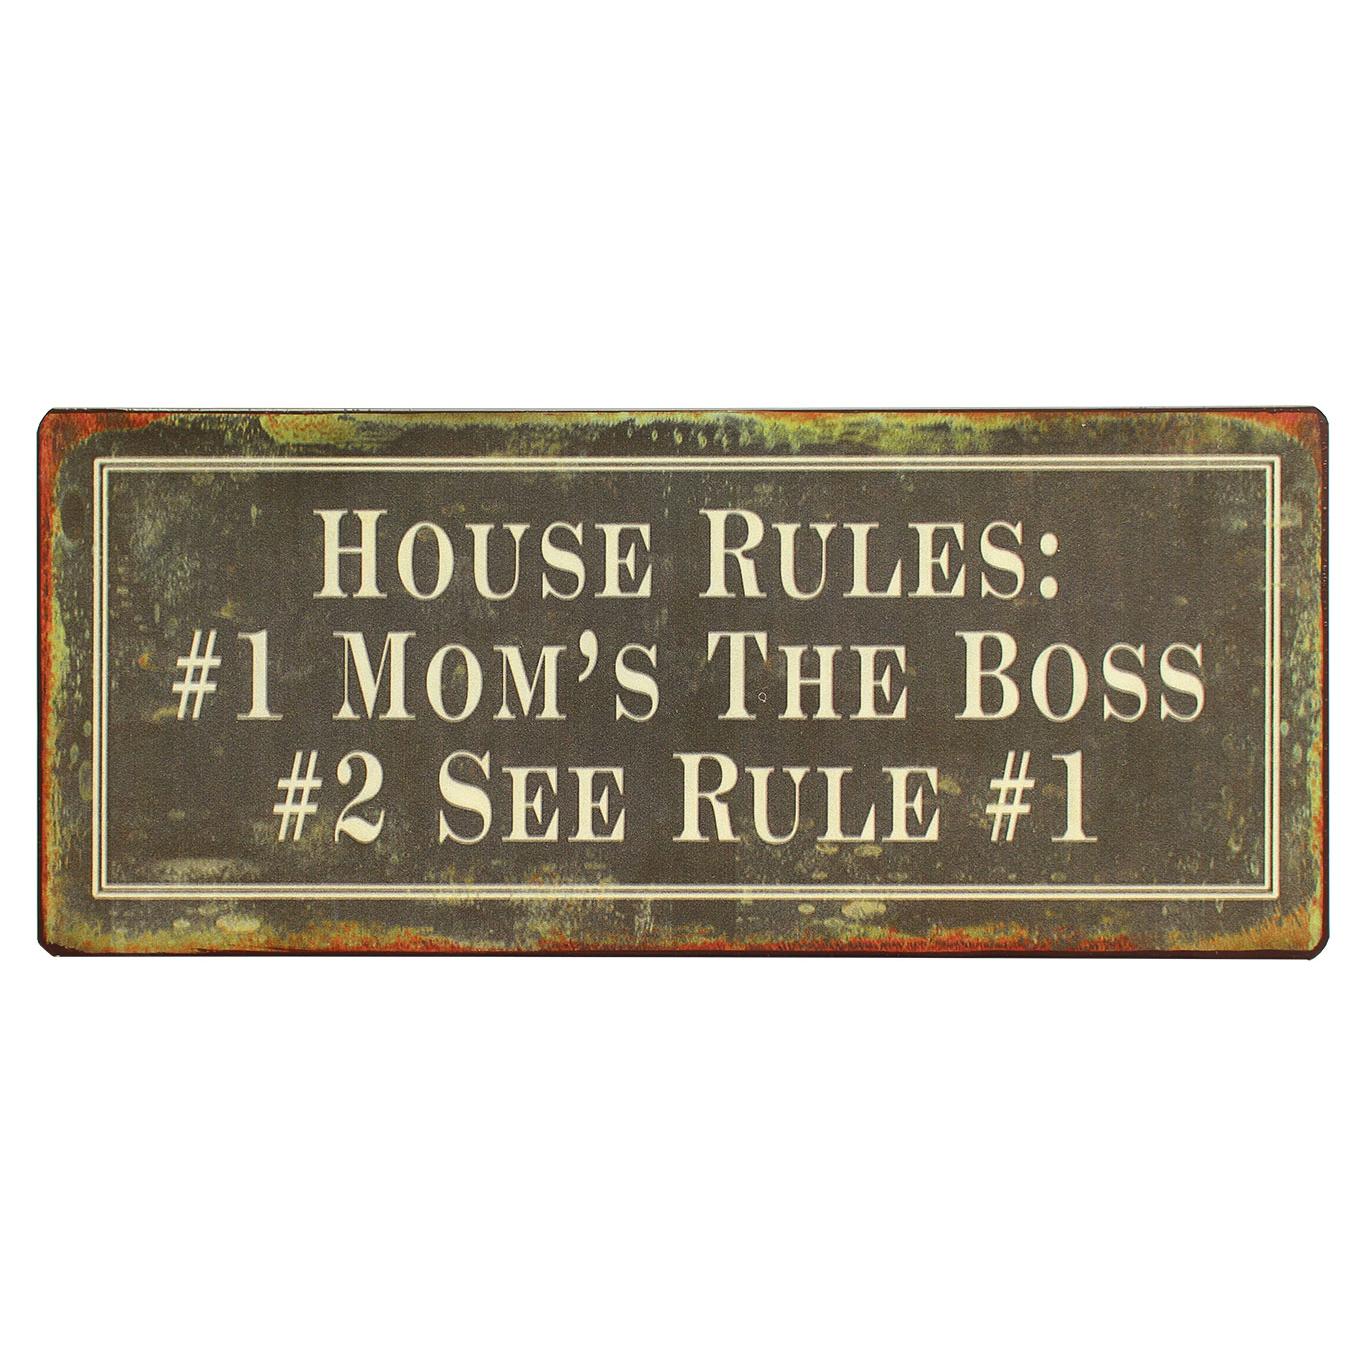 em479-House-rules-mom-is-the-boss-tekstbord-uitspraken-gezegde-spreuken-rustiek-bord-cadeau v